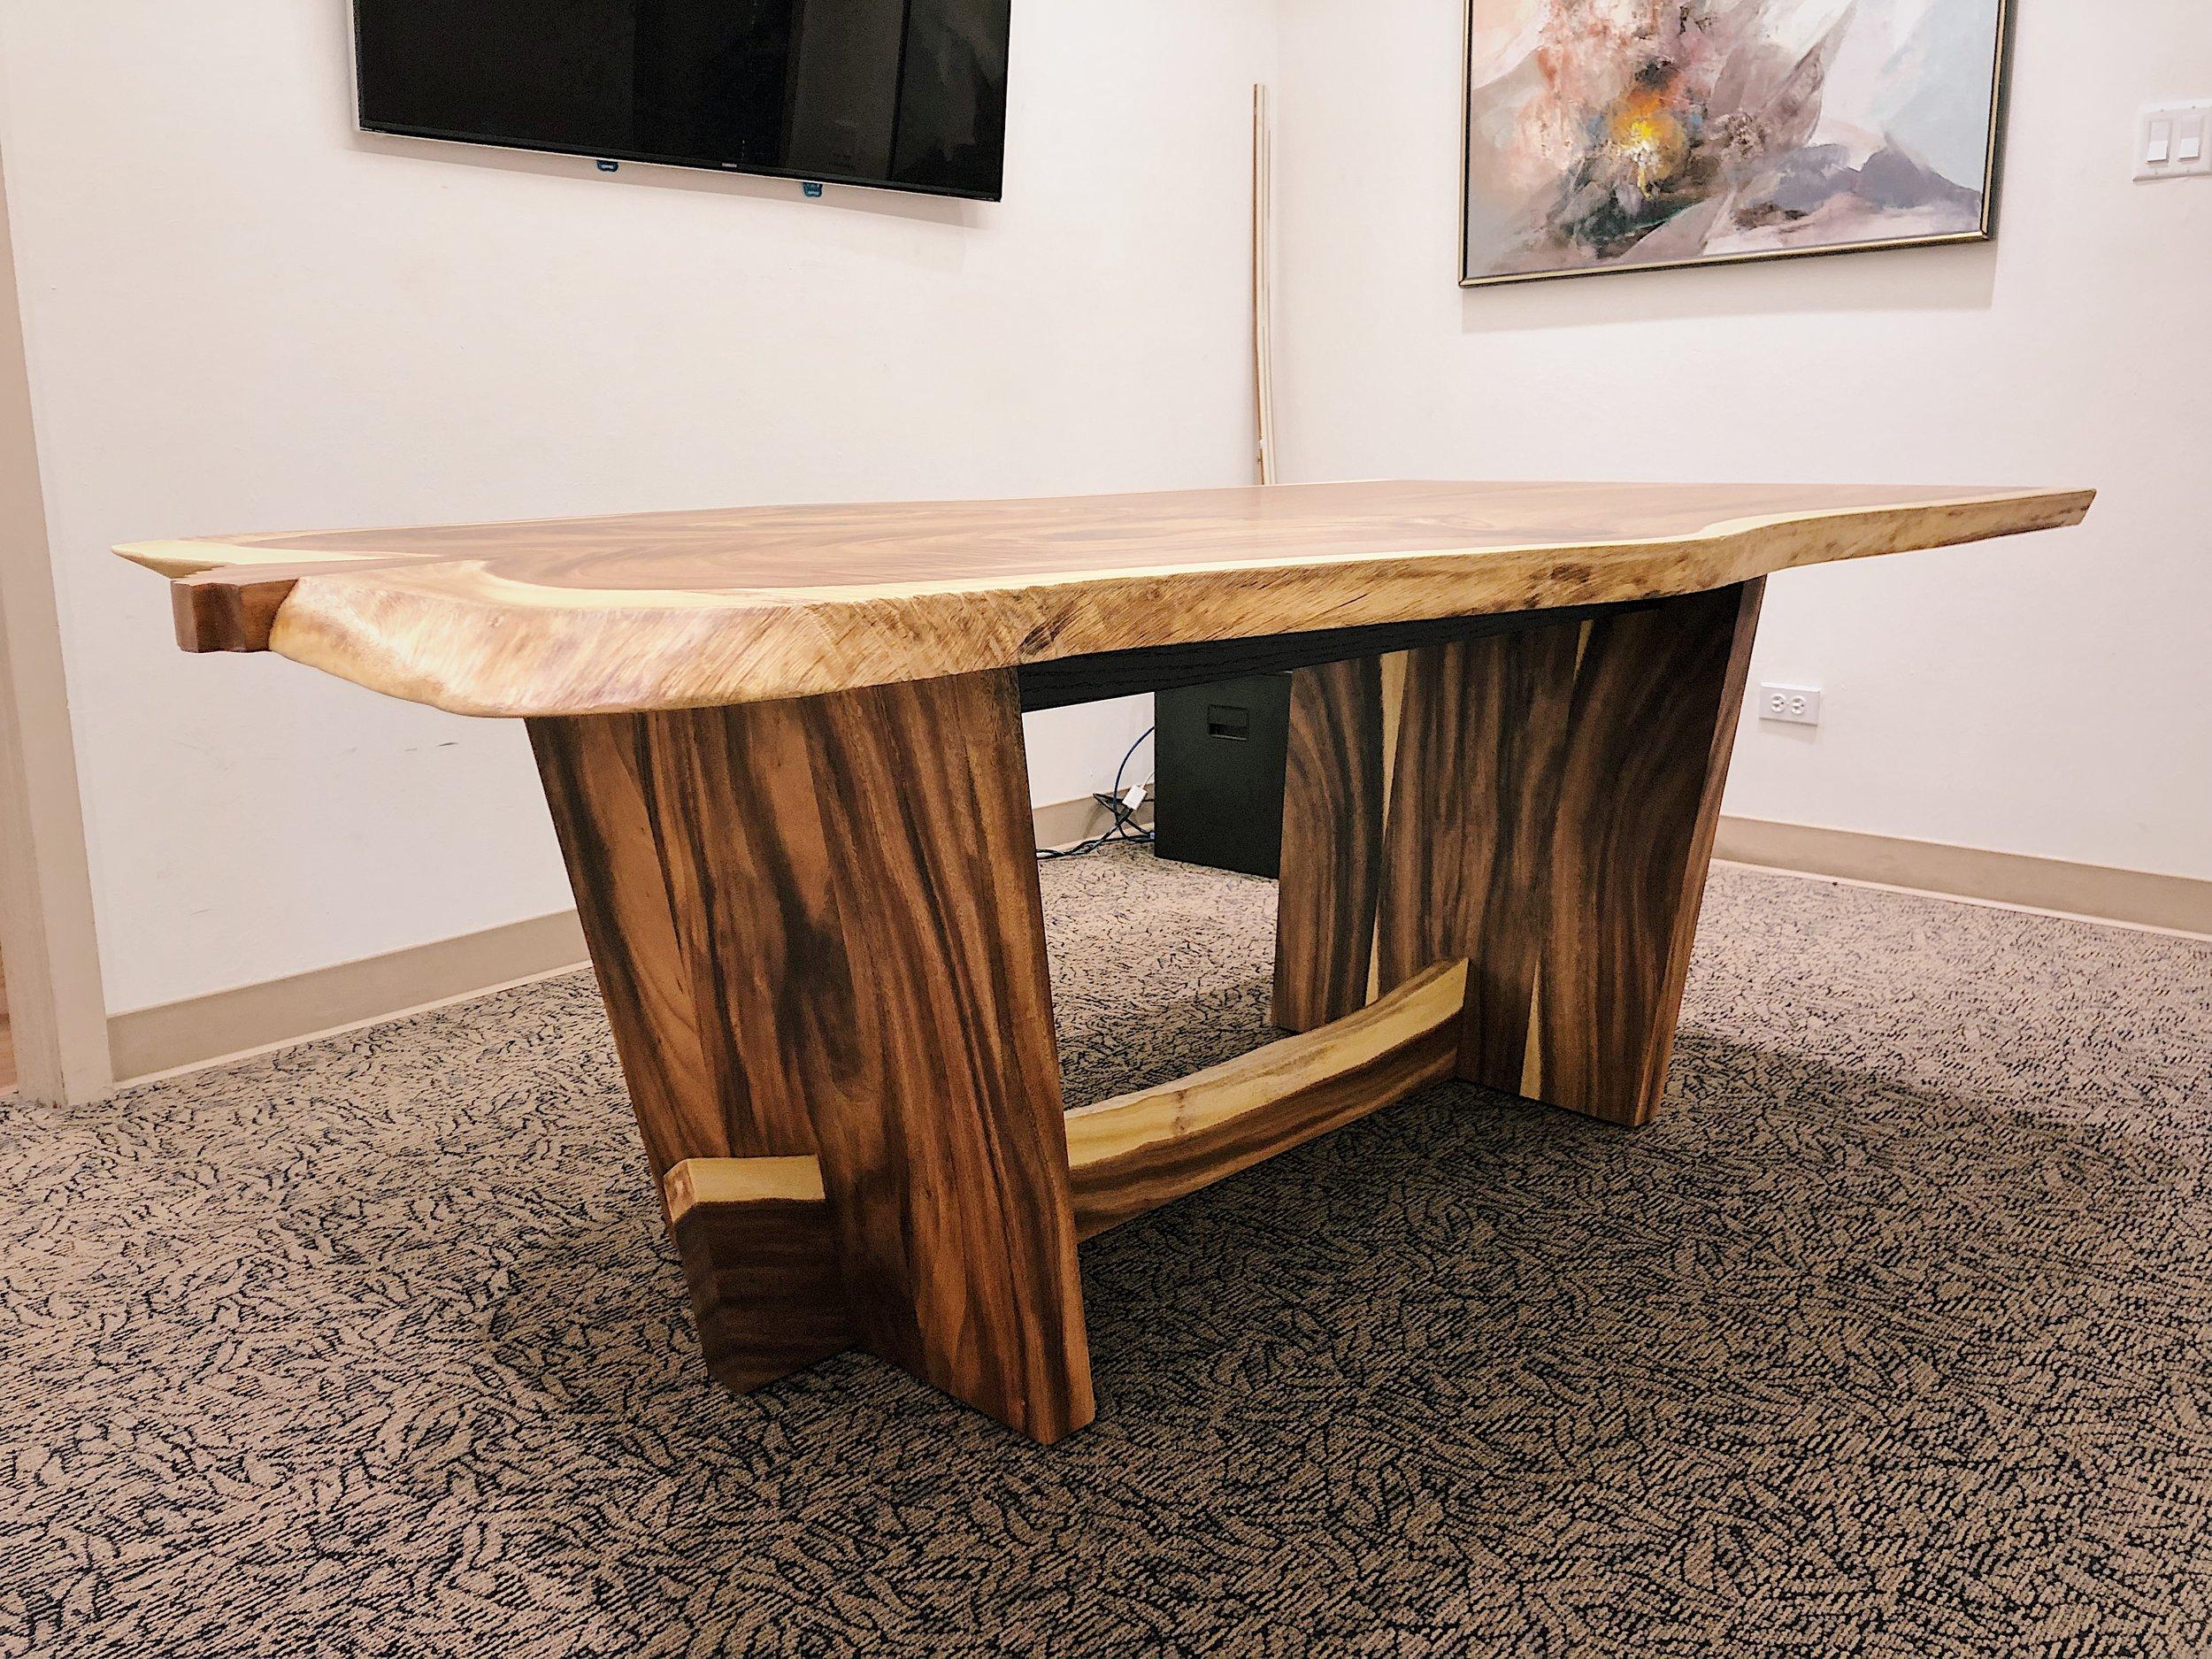 Base inspired by Nakashima's Conoid Table